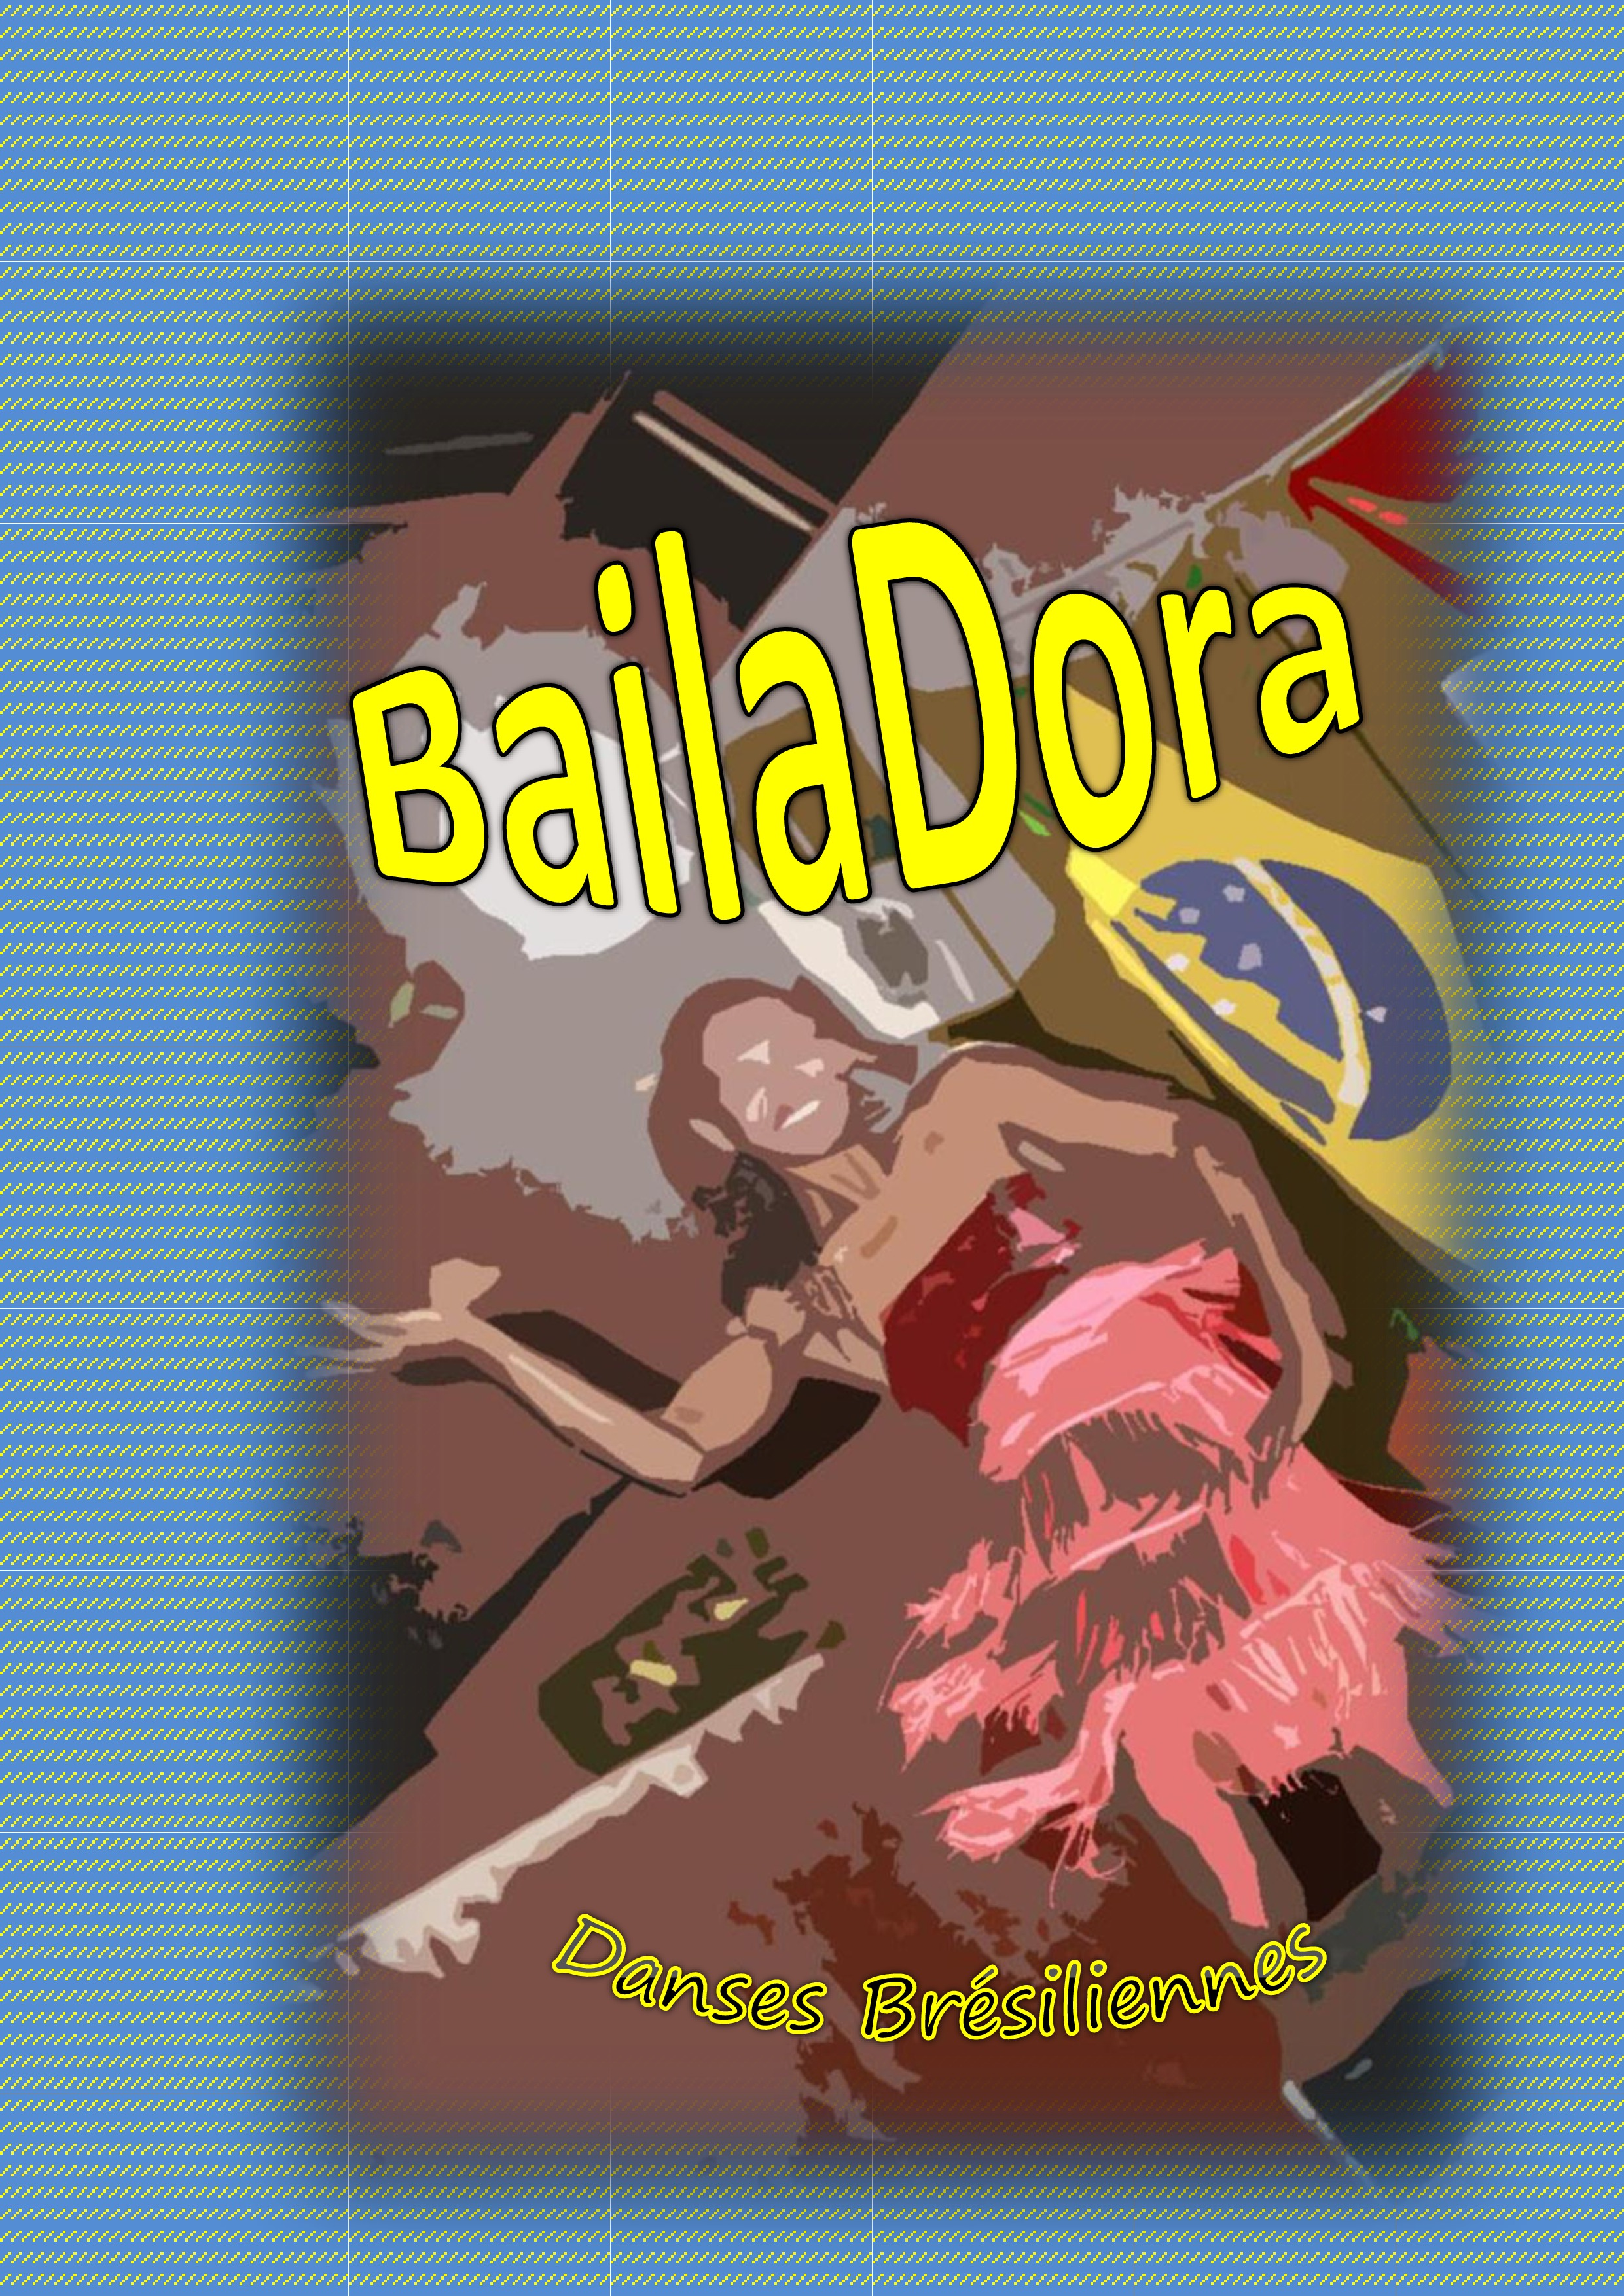 Logo_BailaDora_1-page-0-1466877521.jpg